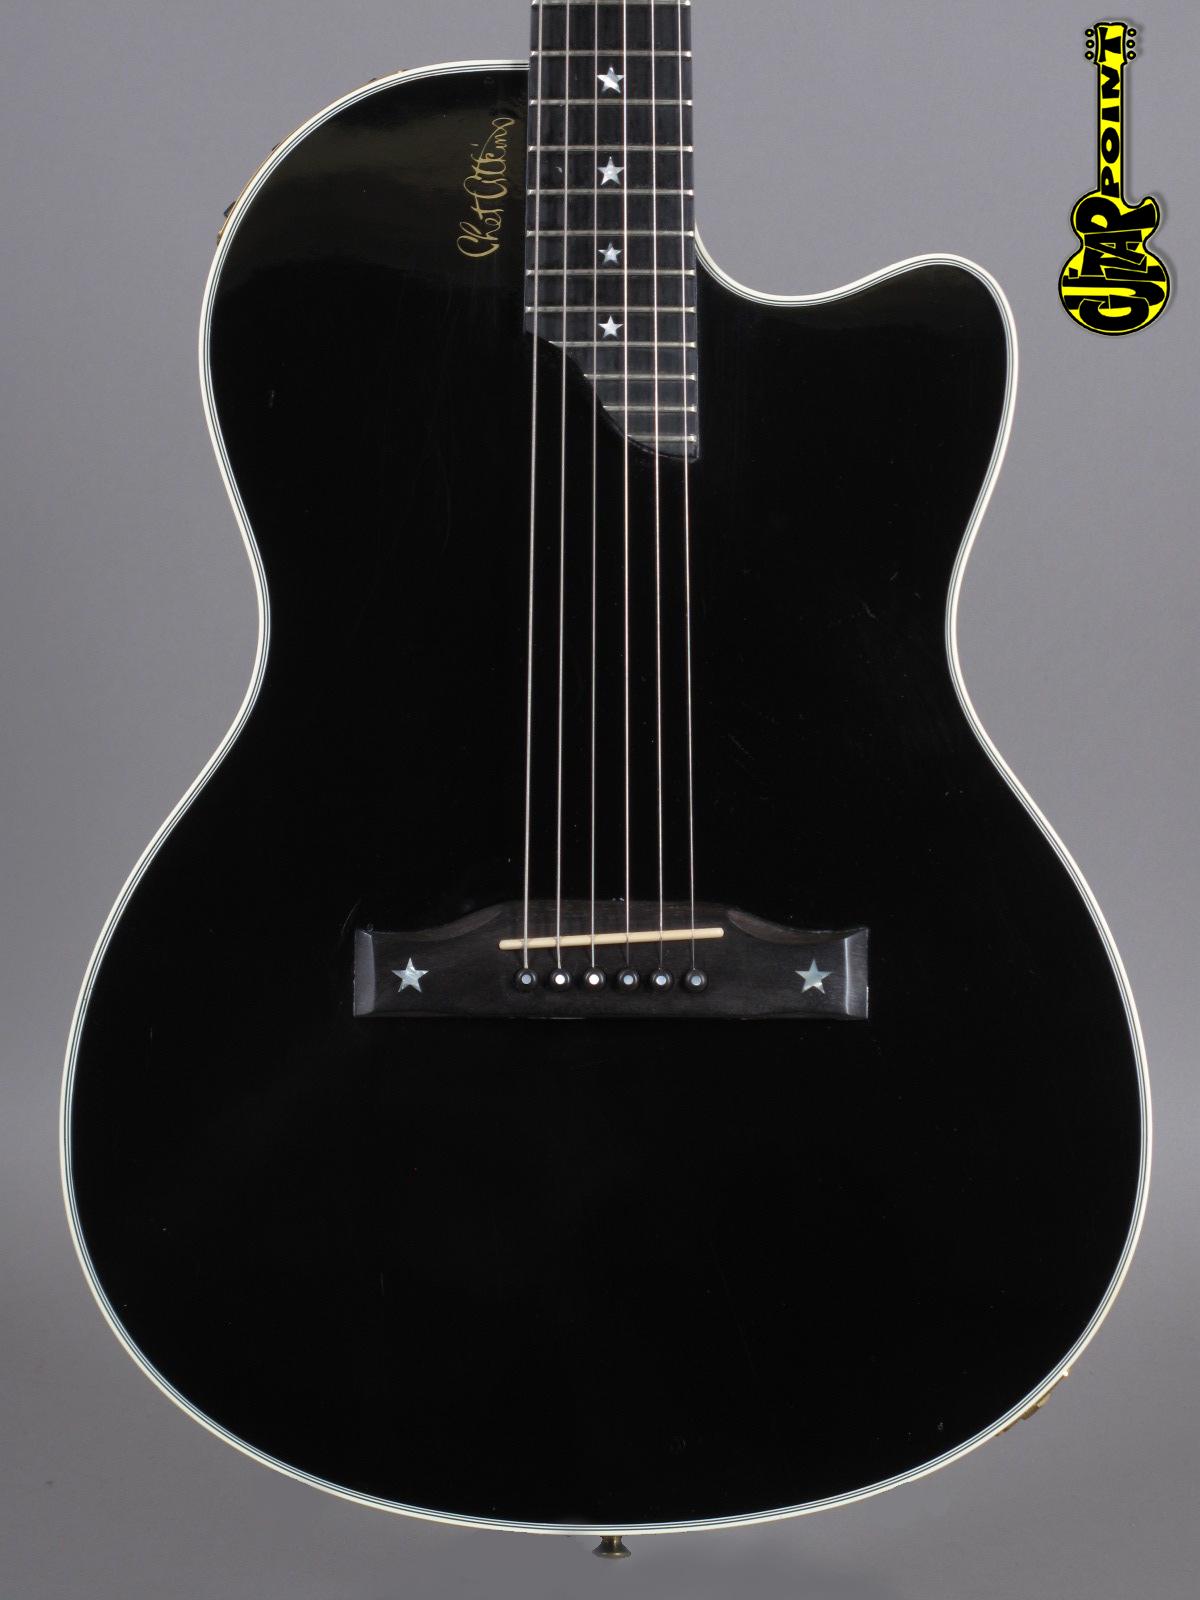 1993 Gibson Chet Atkins SST - Ebony